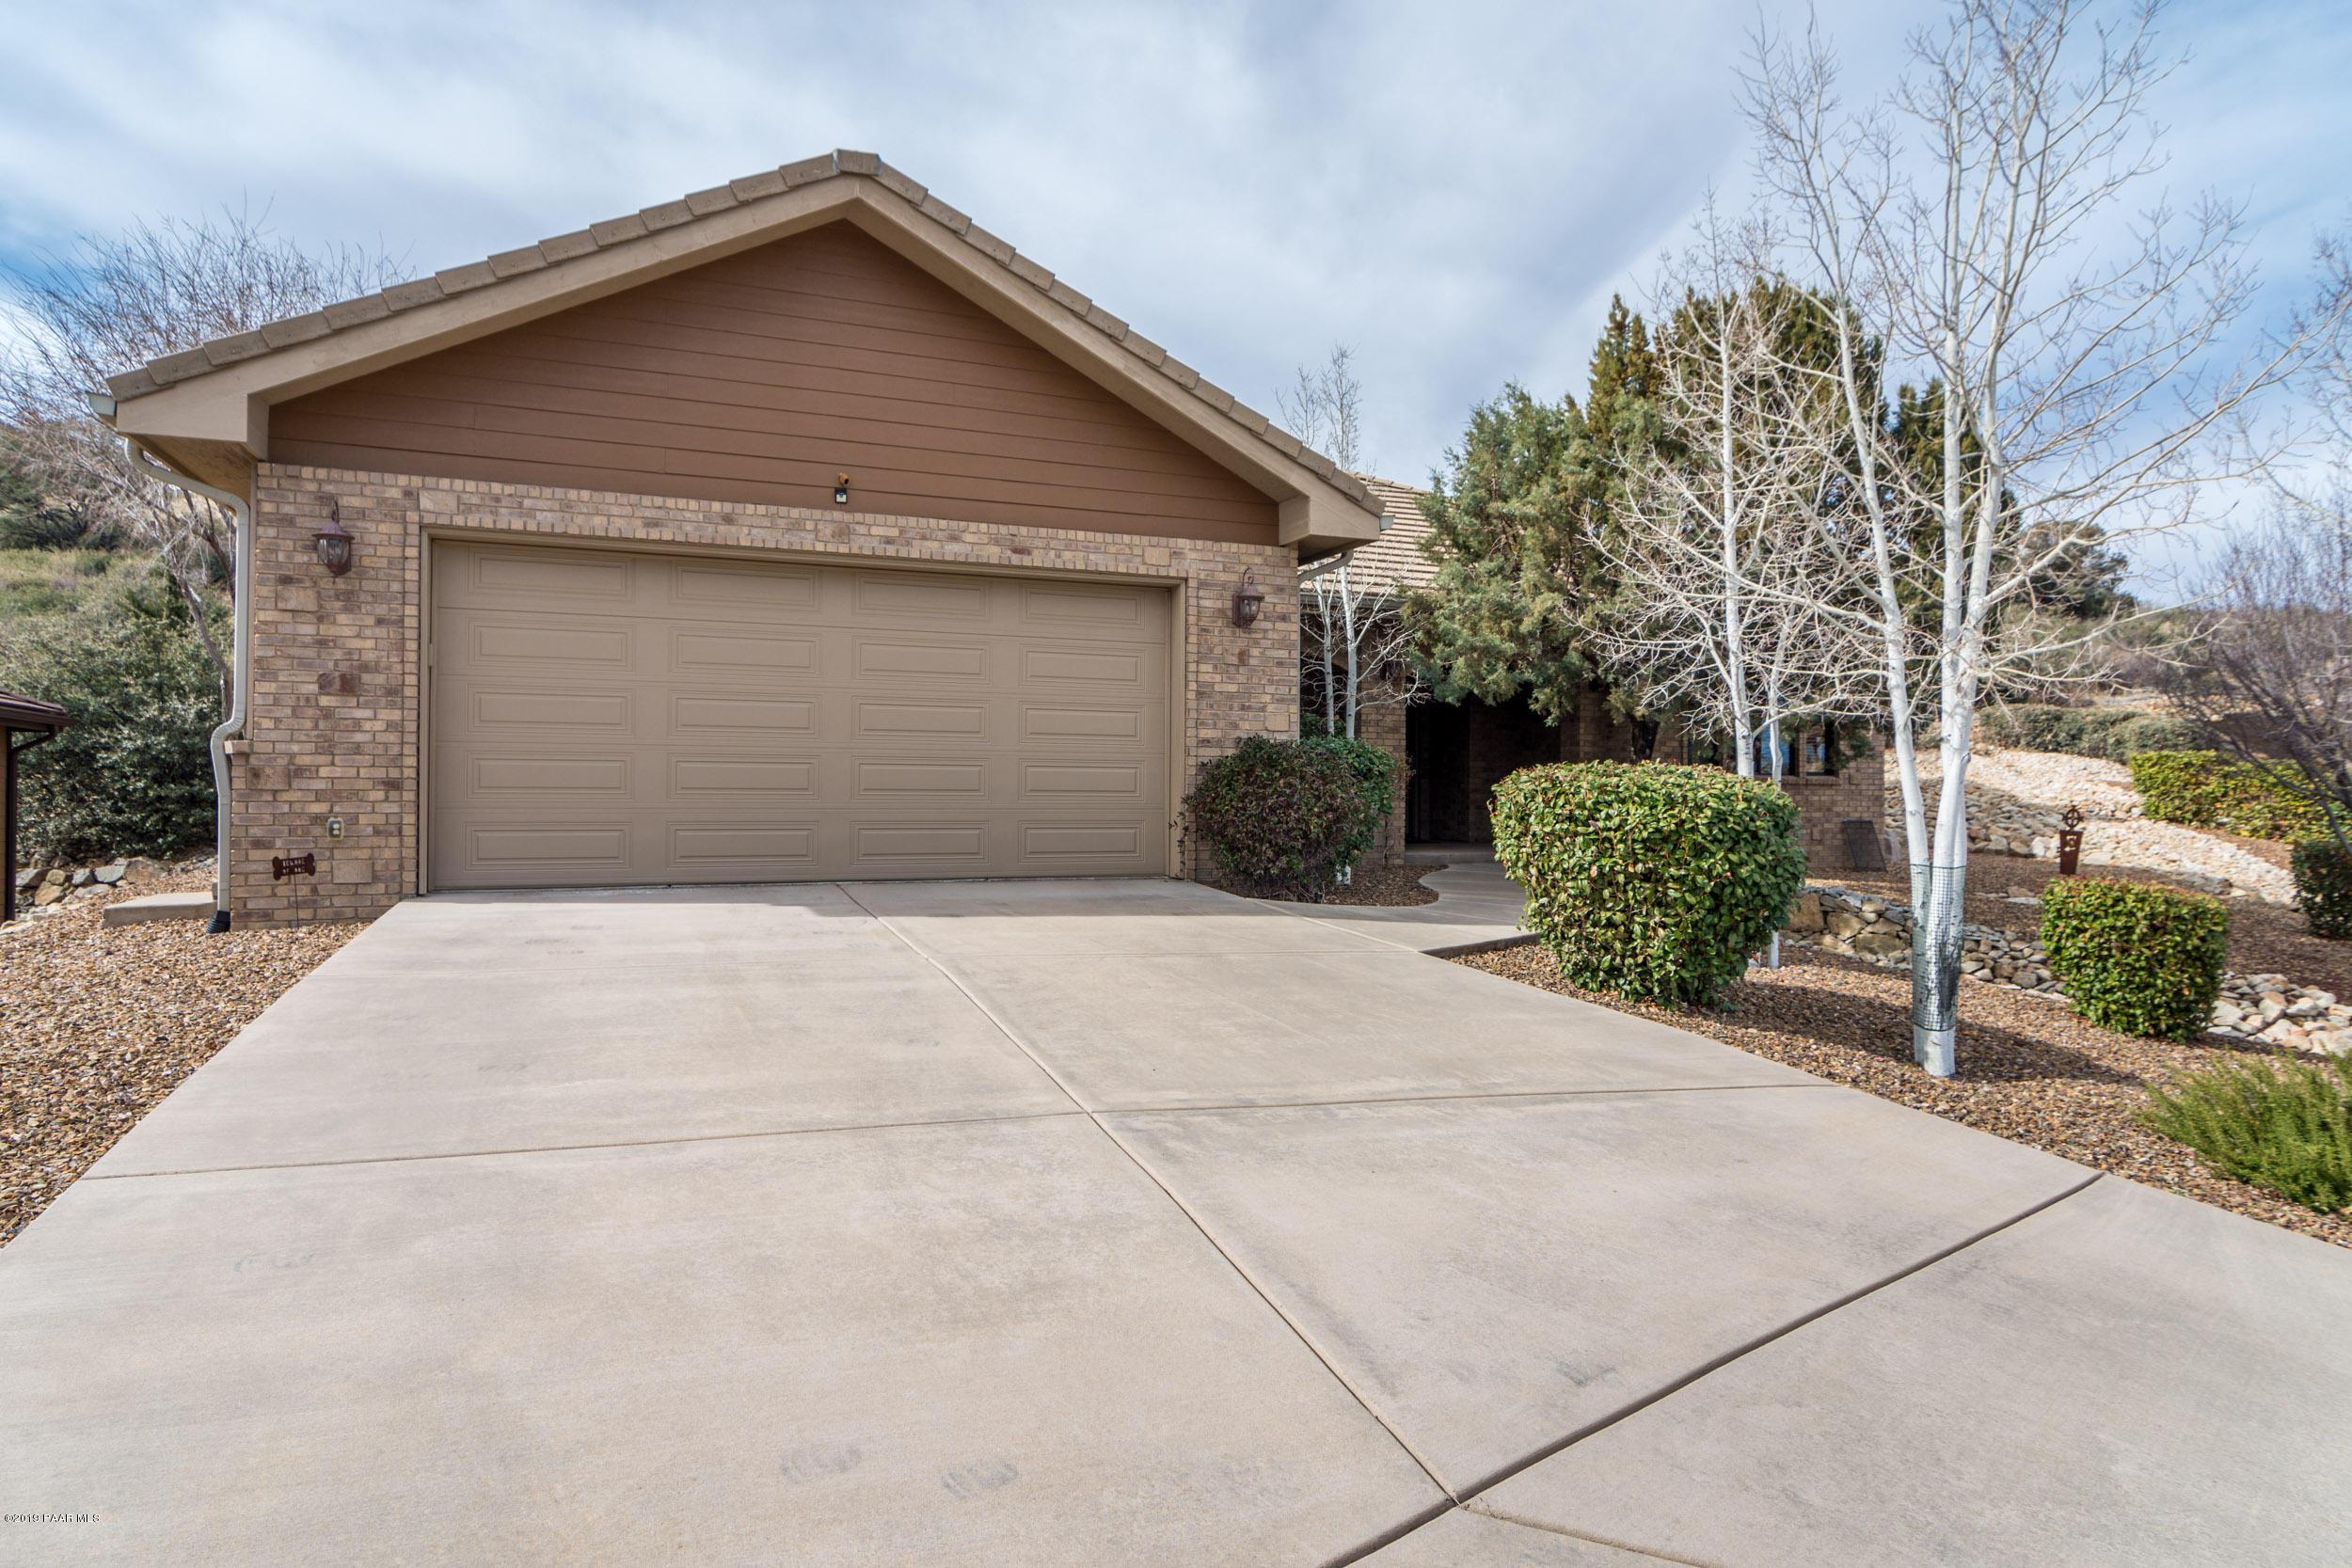 Photo of 145 Soaring, Prescott, AZ 86301